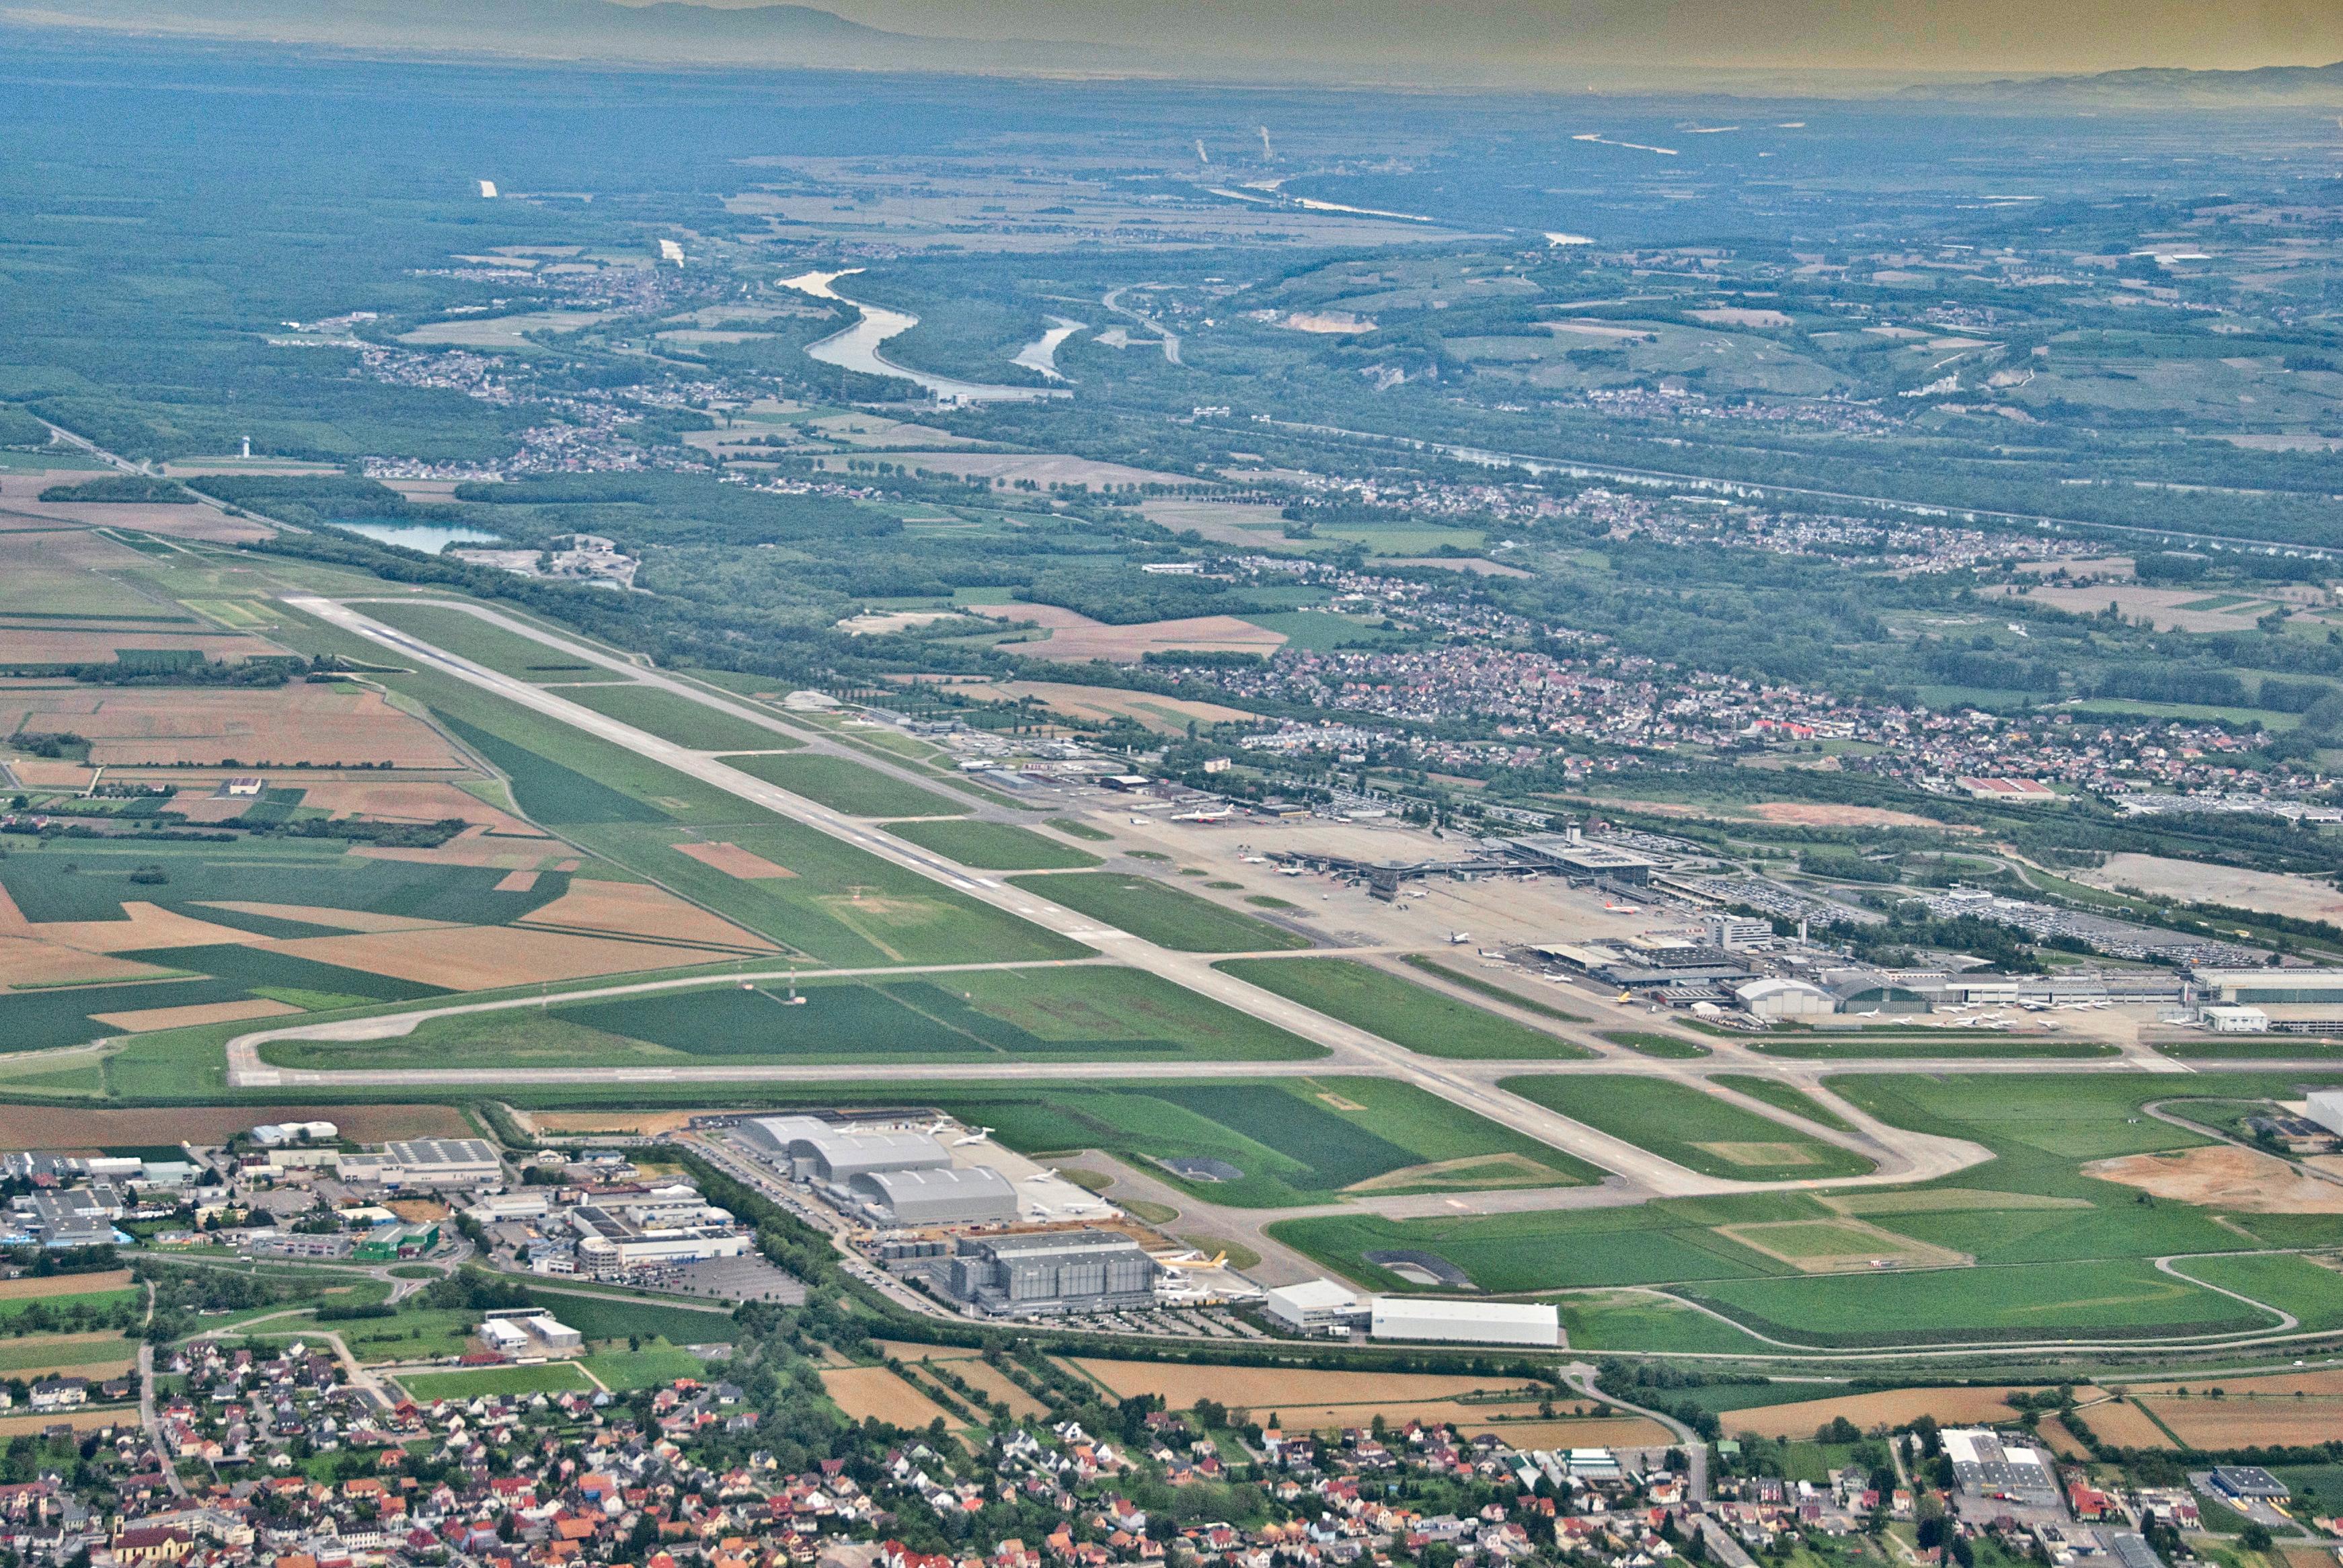 Euroairport Sur